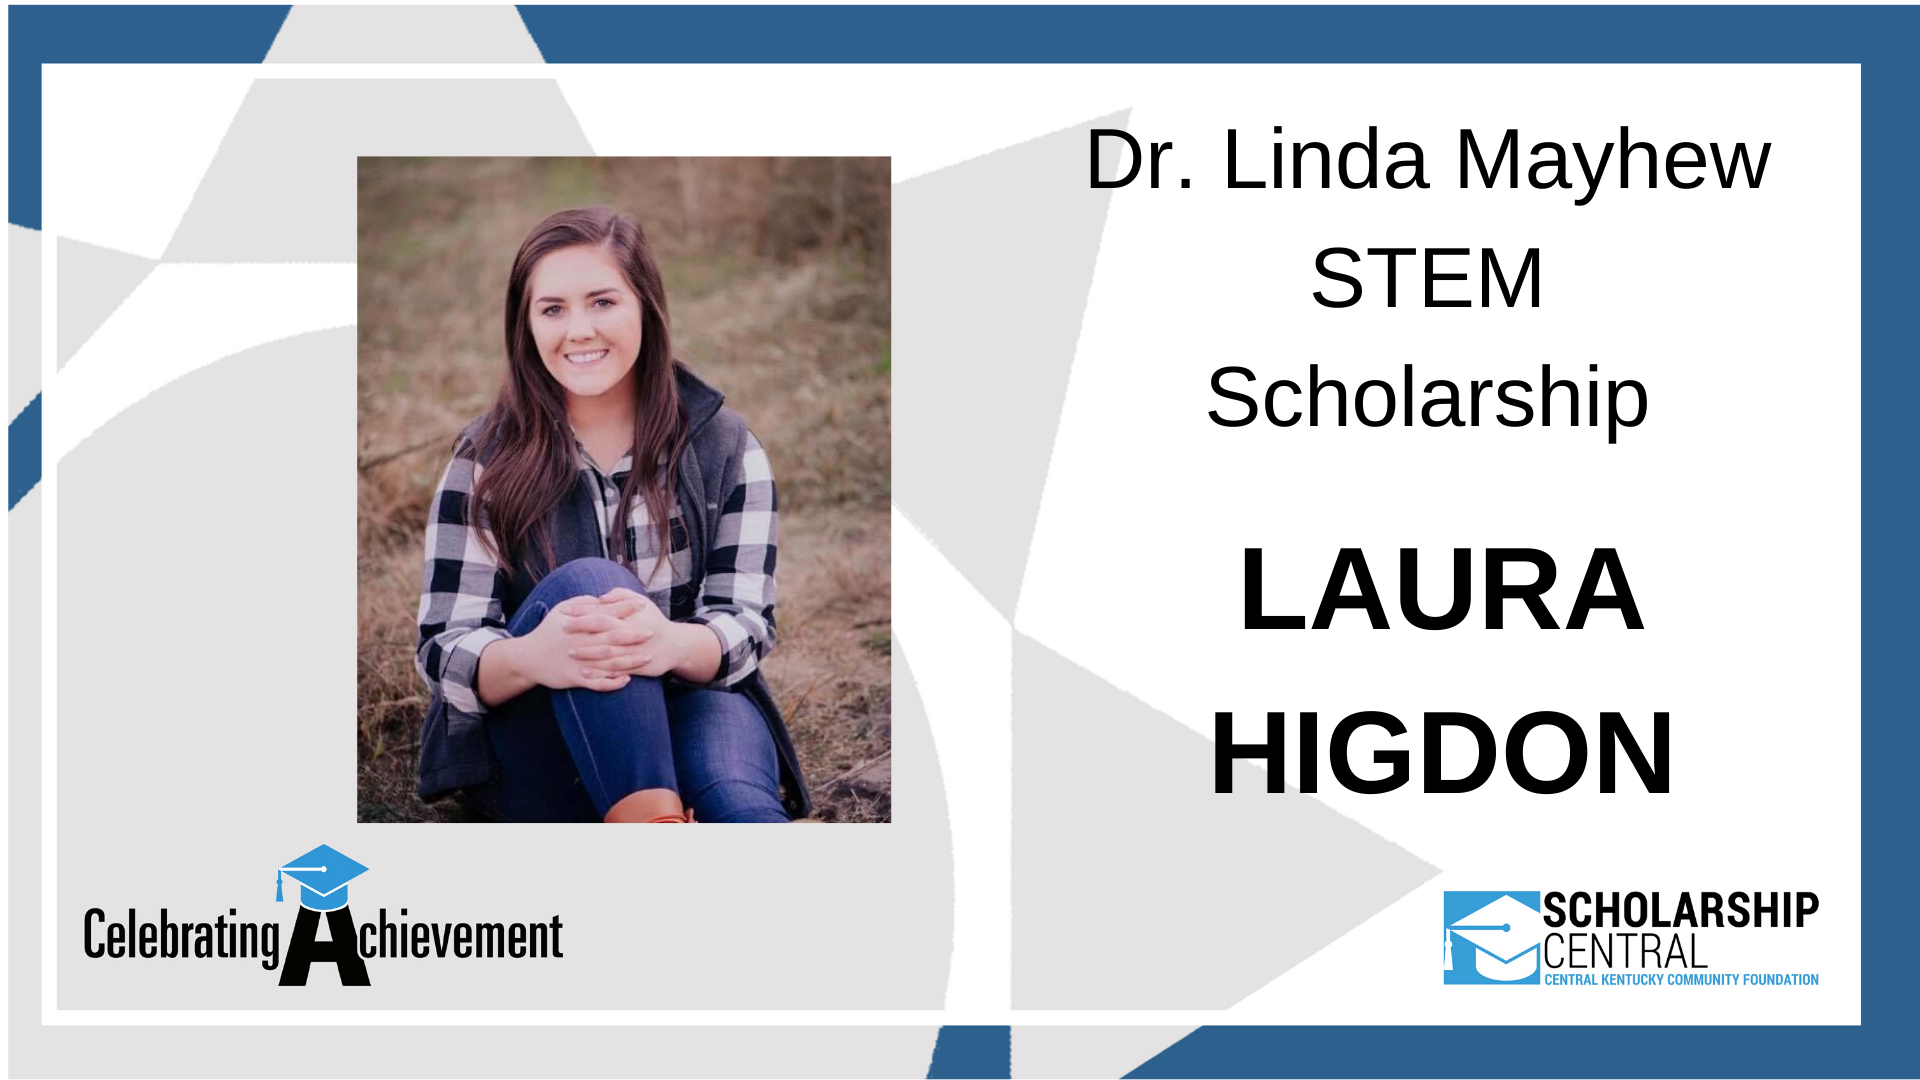 Dr Linda Mayhew STEM Scholarship